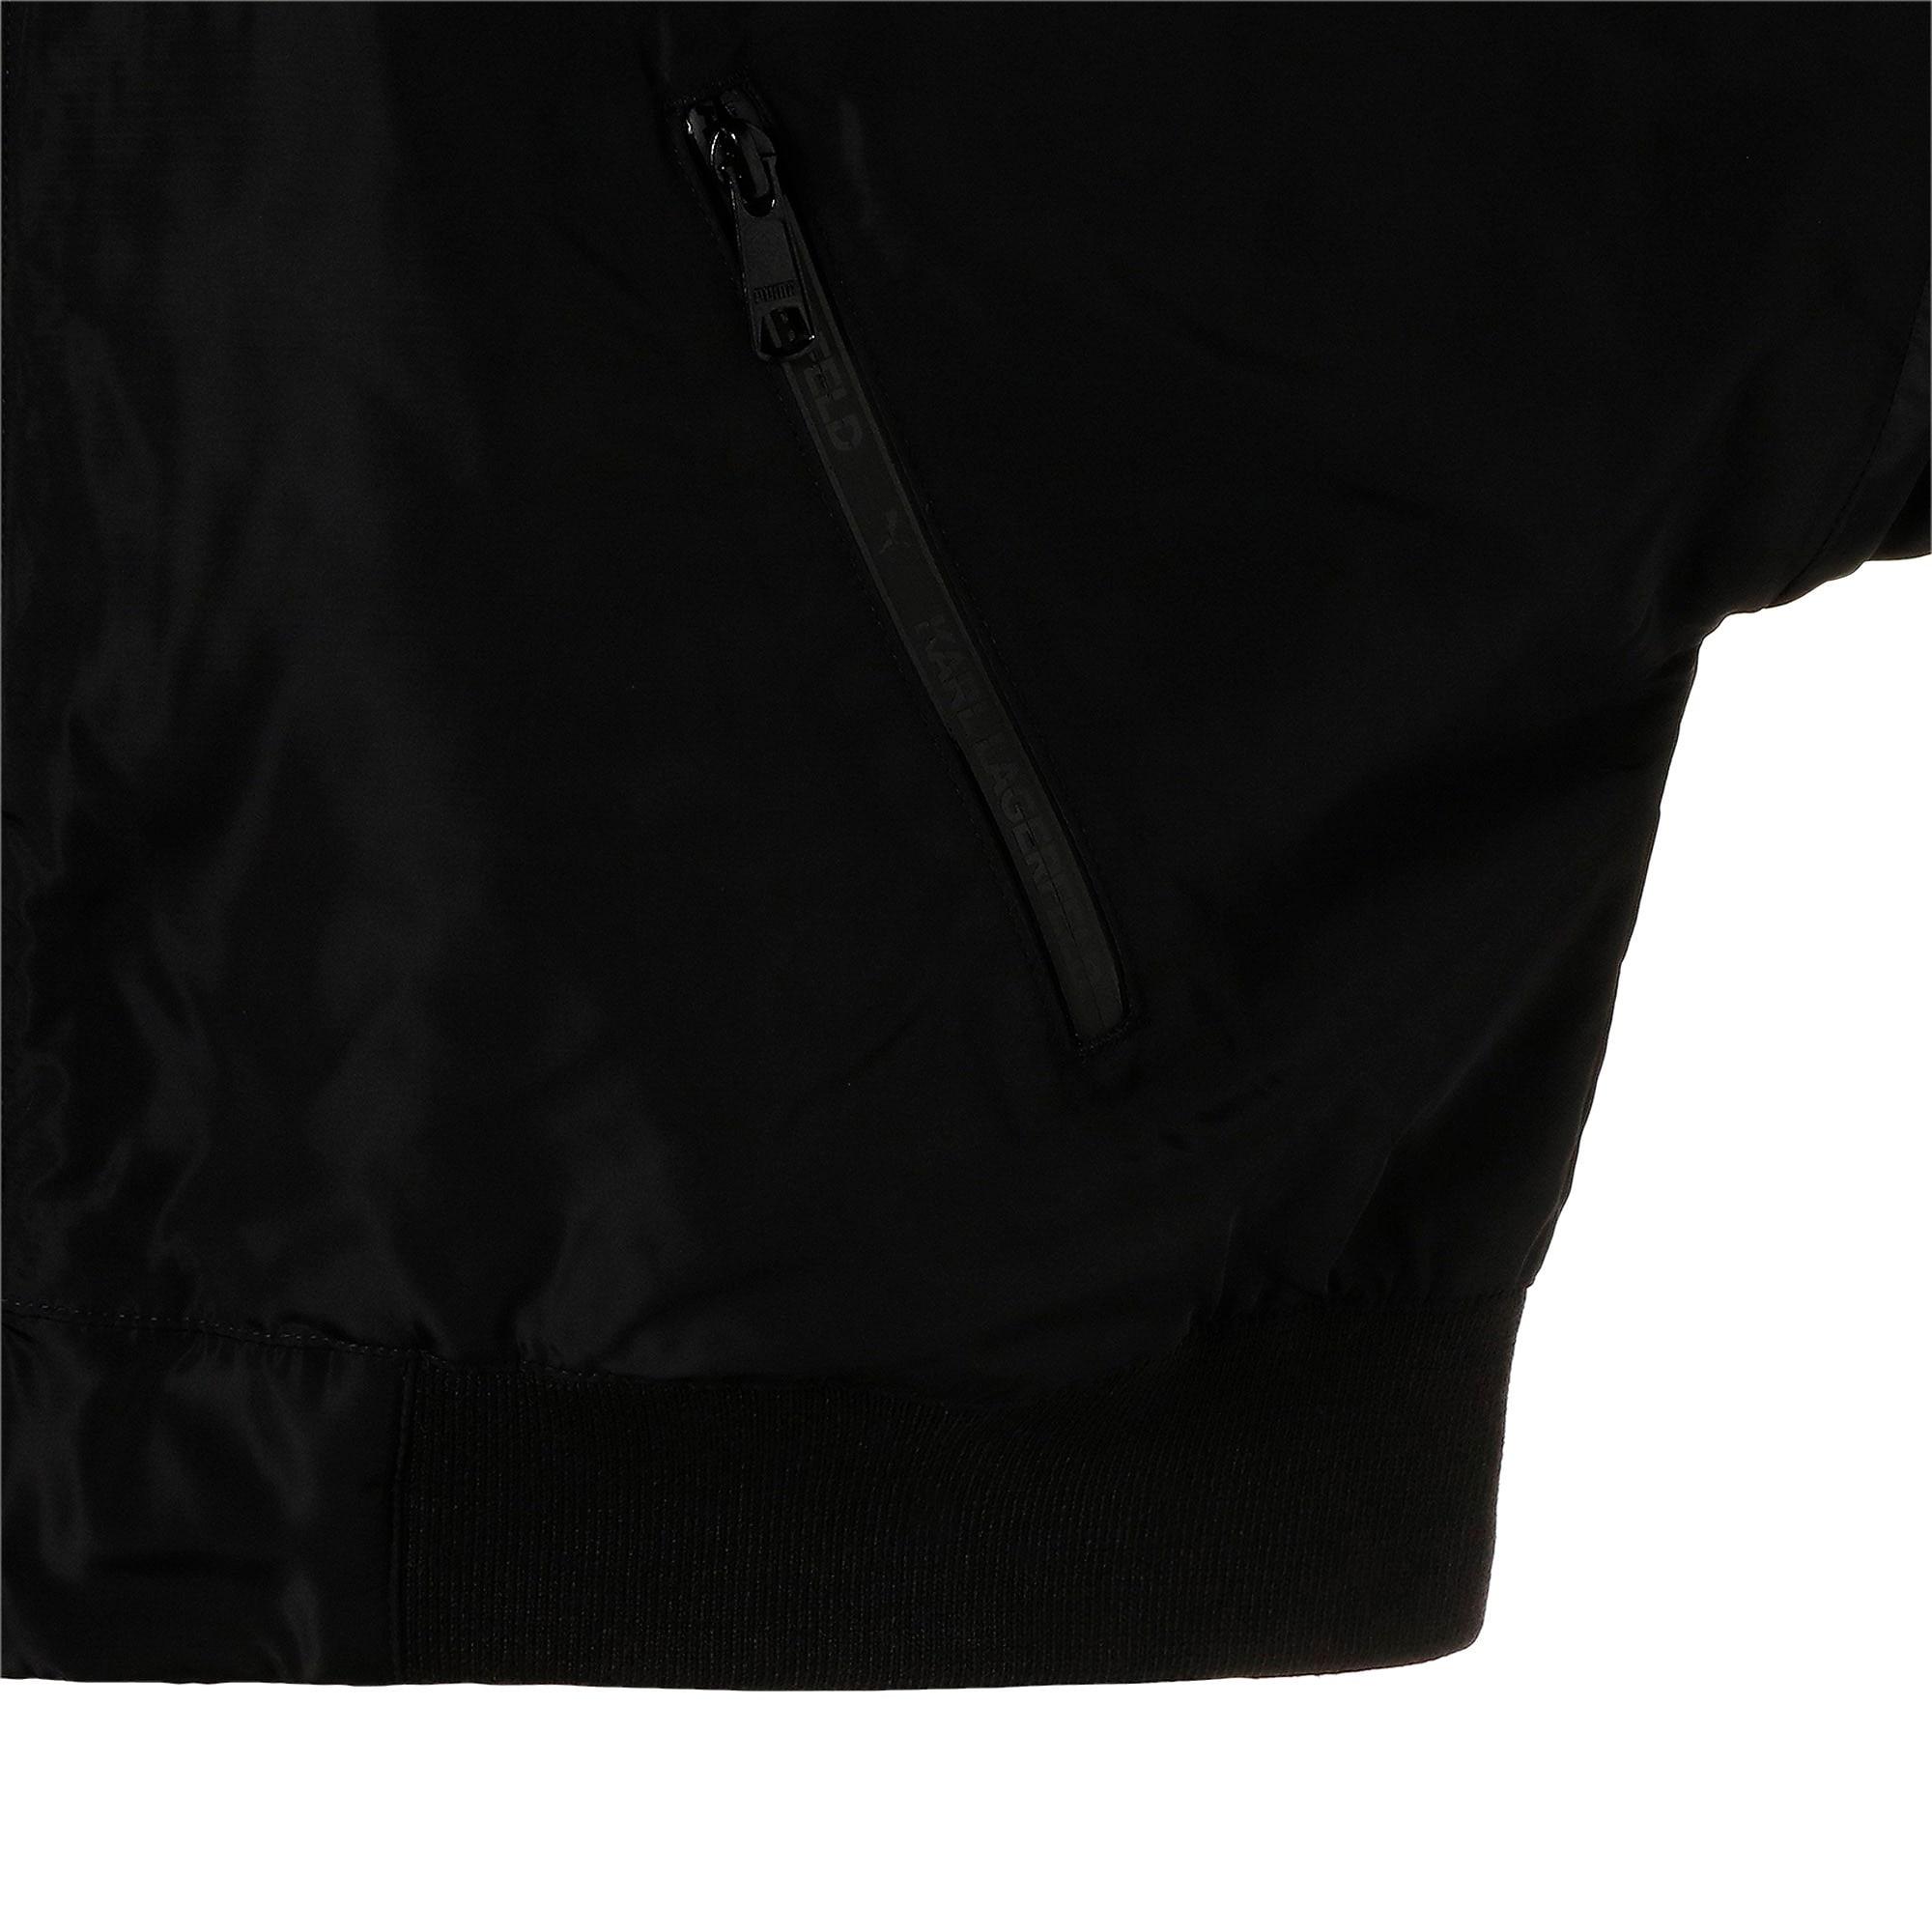 Thumbnail 9 of PUMA x KARL LAGERFELD ウィメンズ ボンバージャケット, Puma Black, medium-JPN